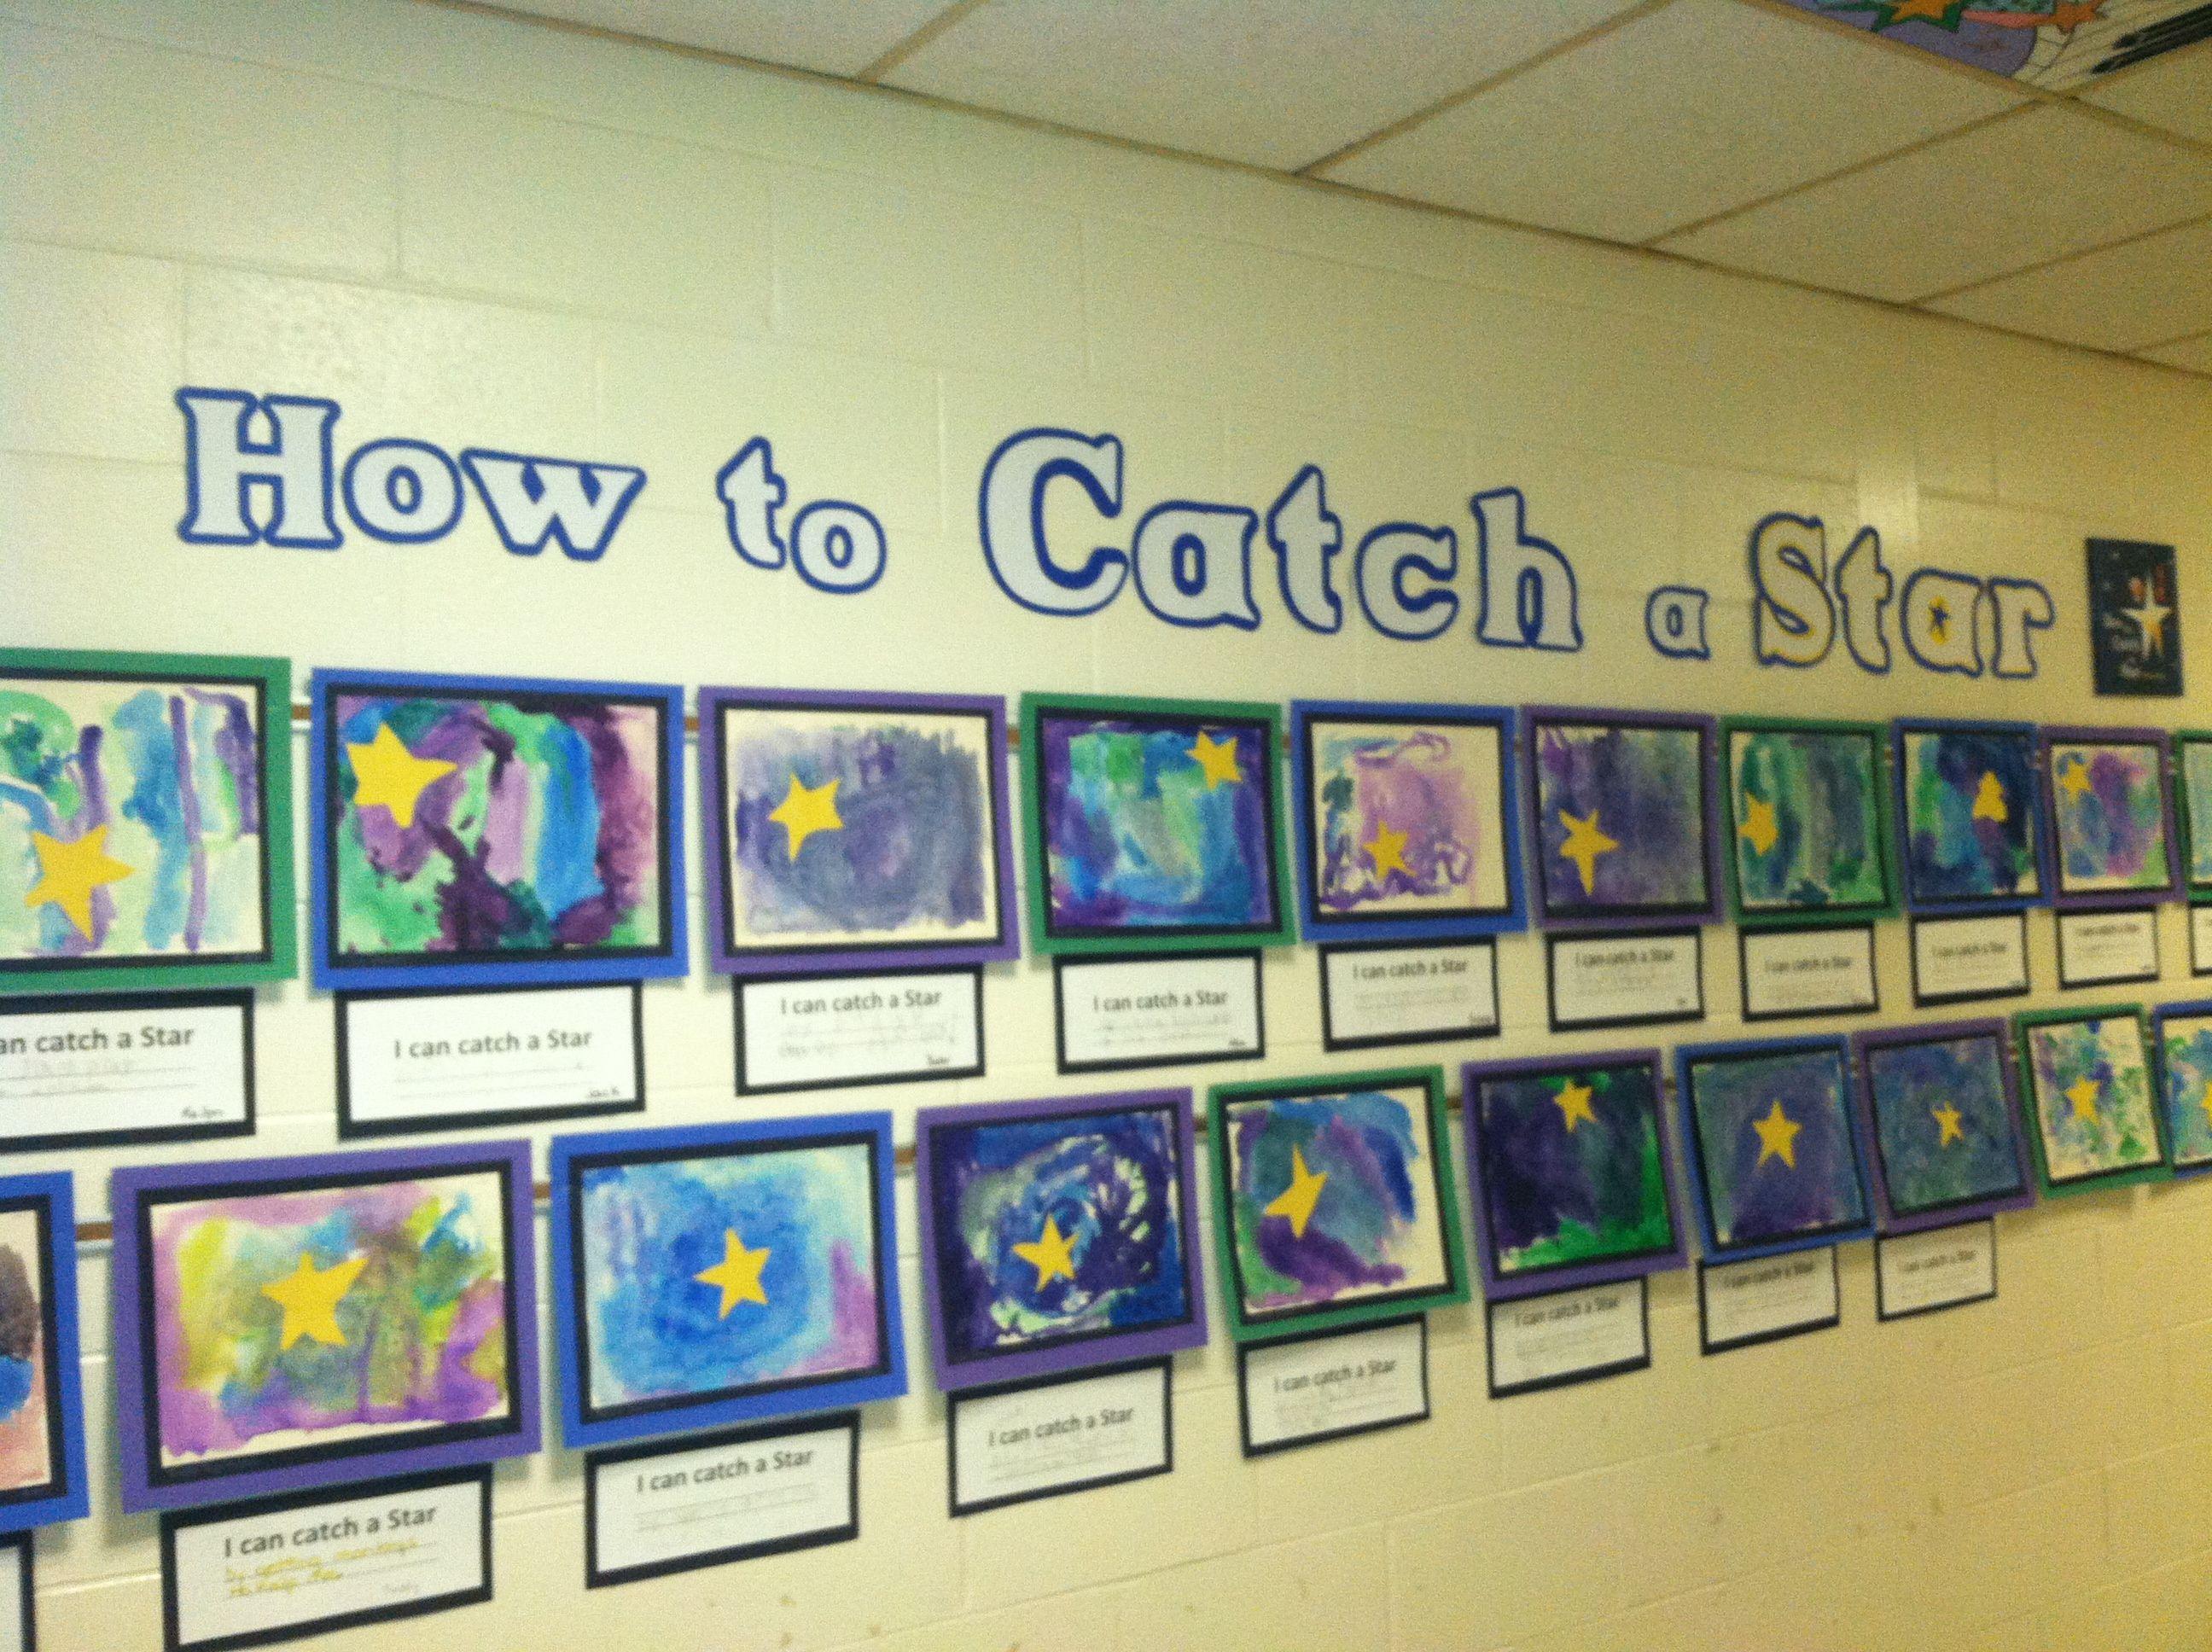 colour mixing activities eyfs : Colour Mixing Activities Eyfs Kindergarten How To Catch A Star Watercolor Salt Cut Paper Project